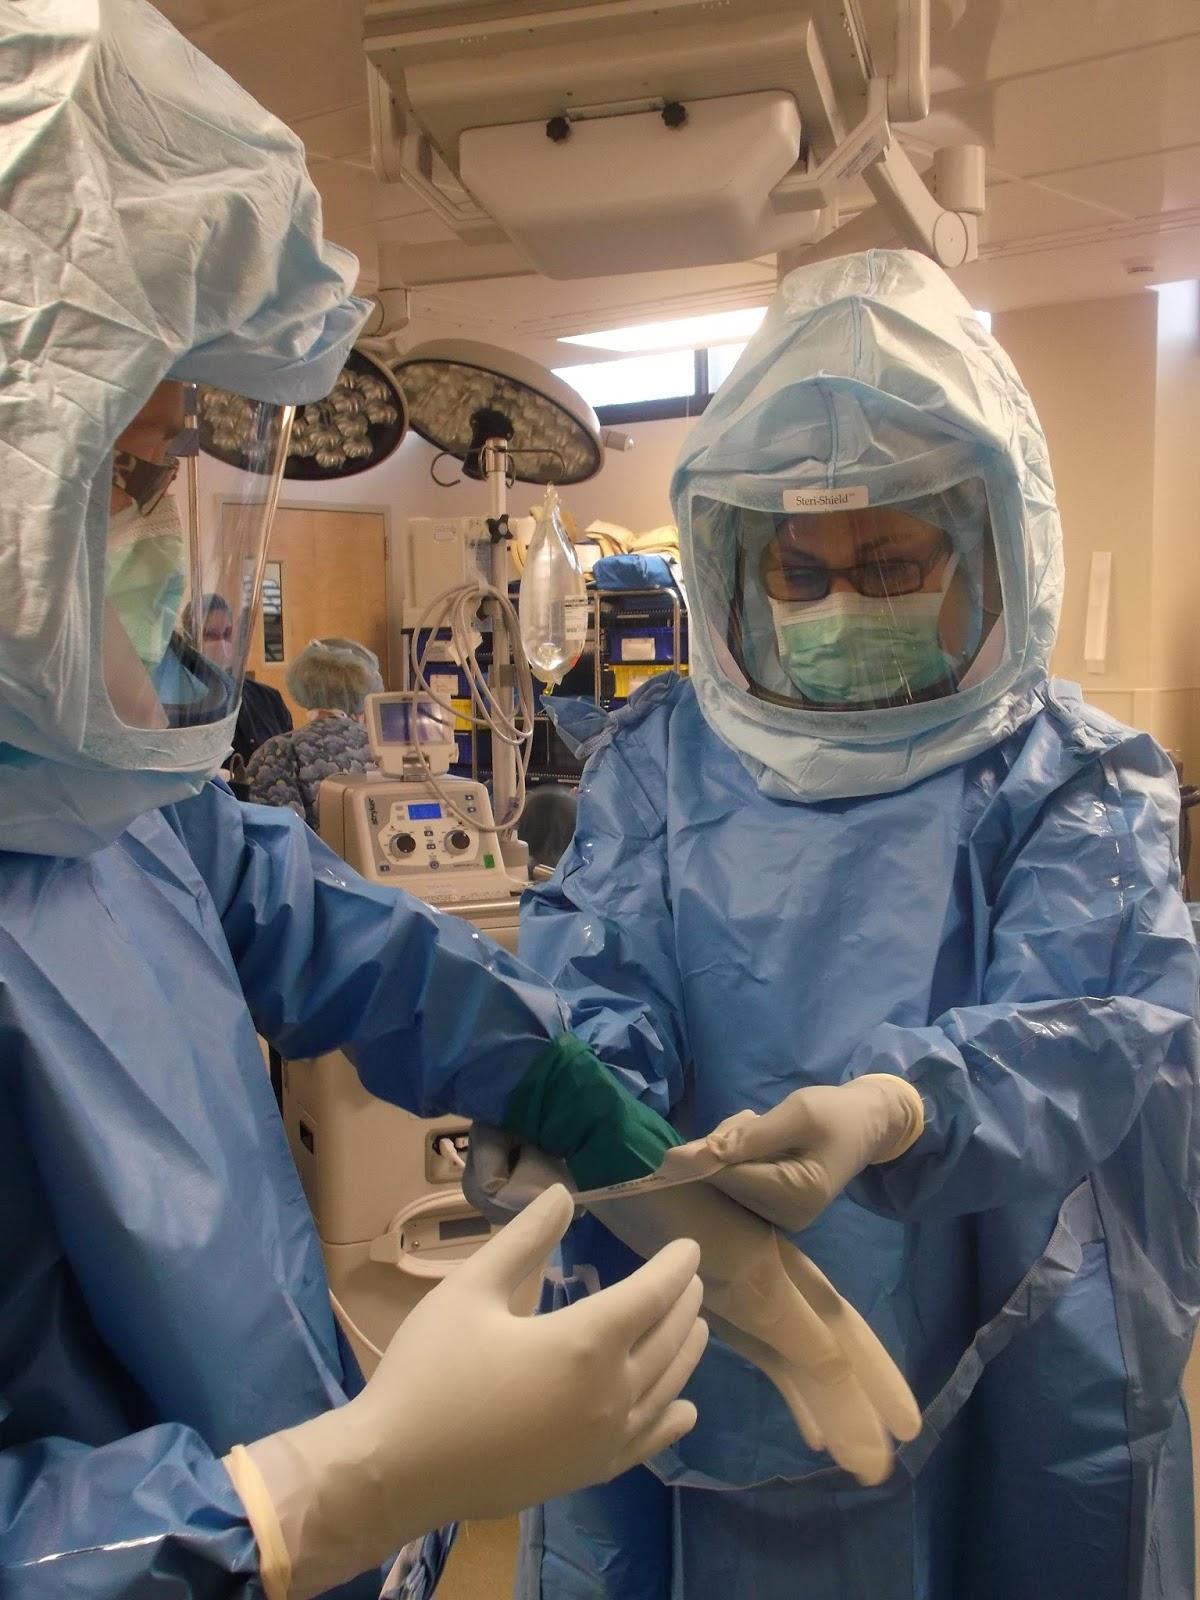 Nurses That Assist In Surgery